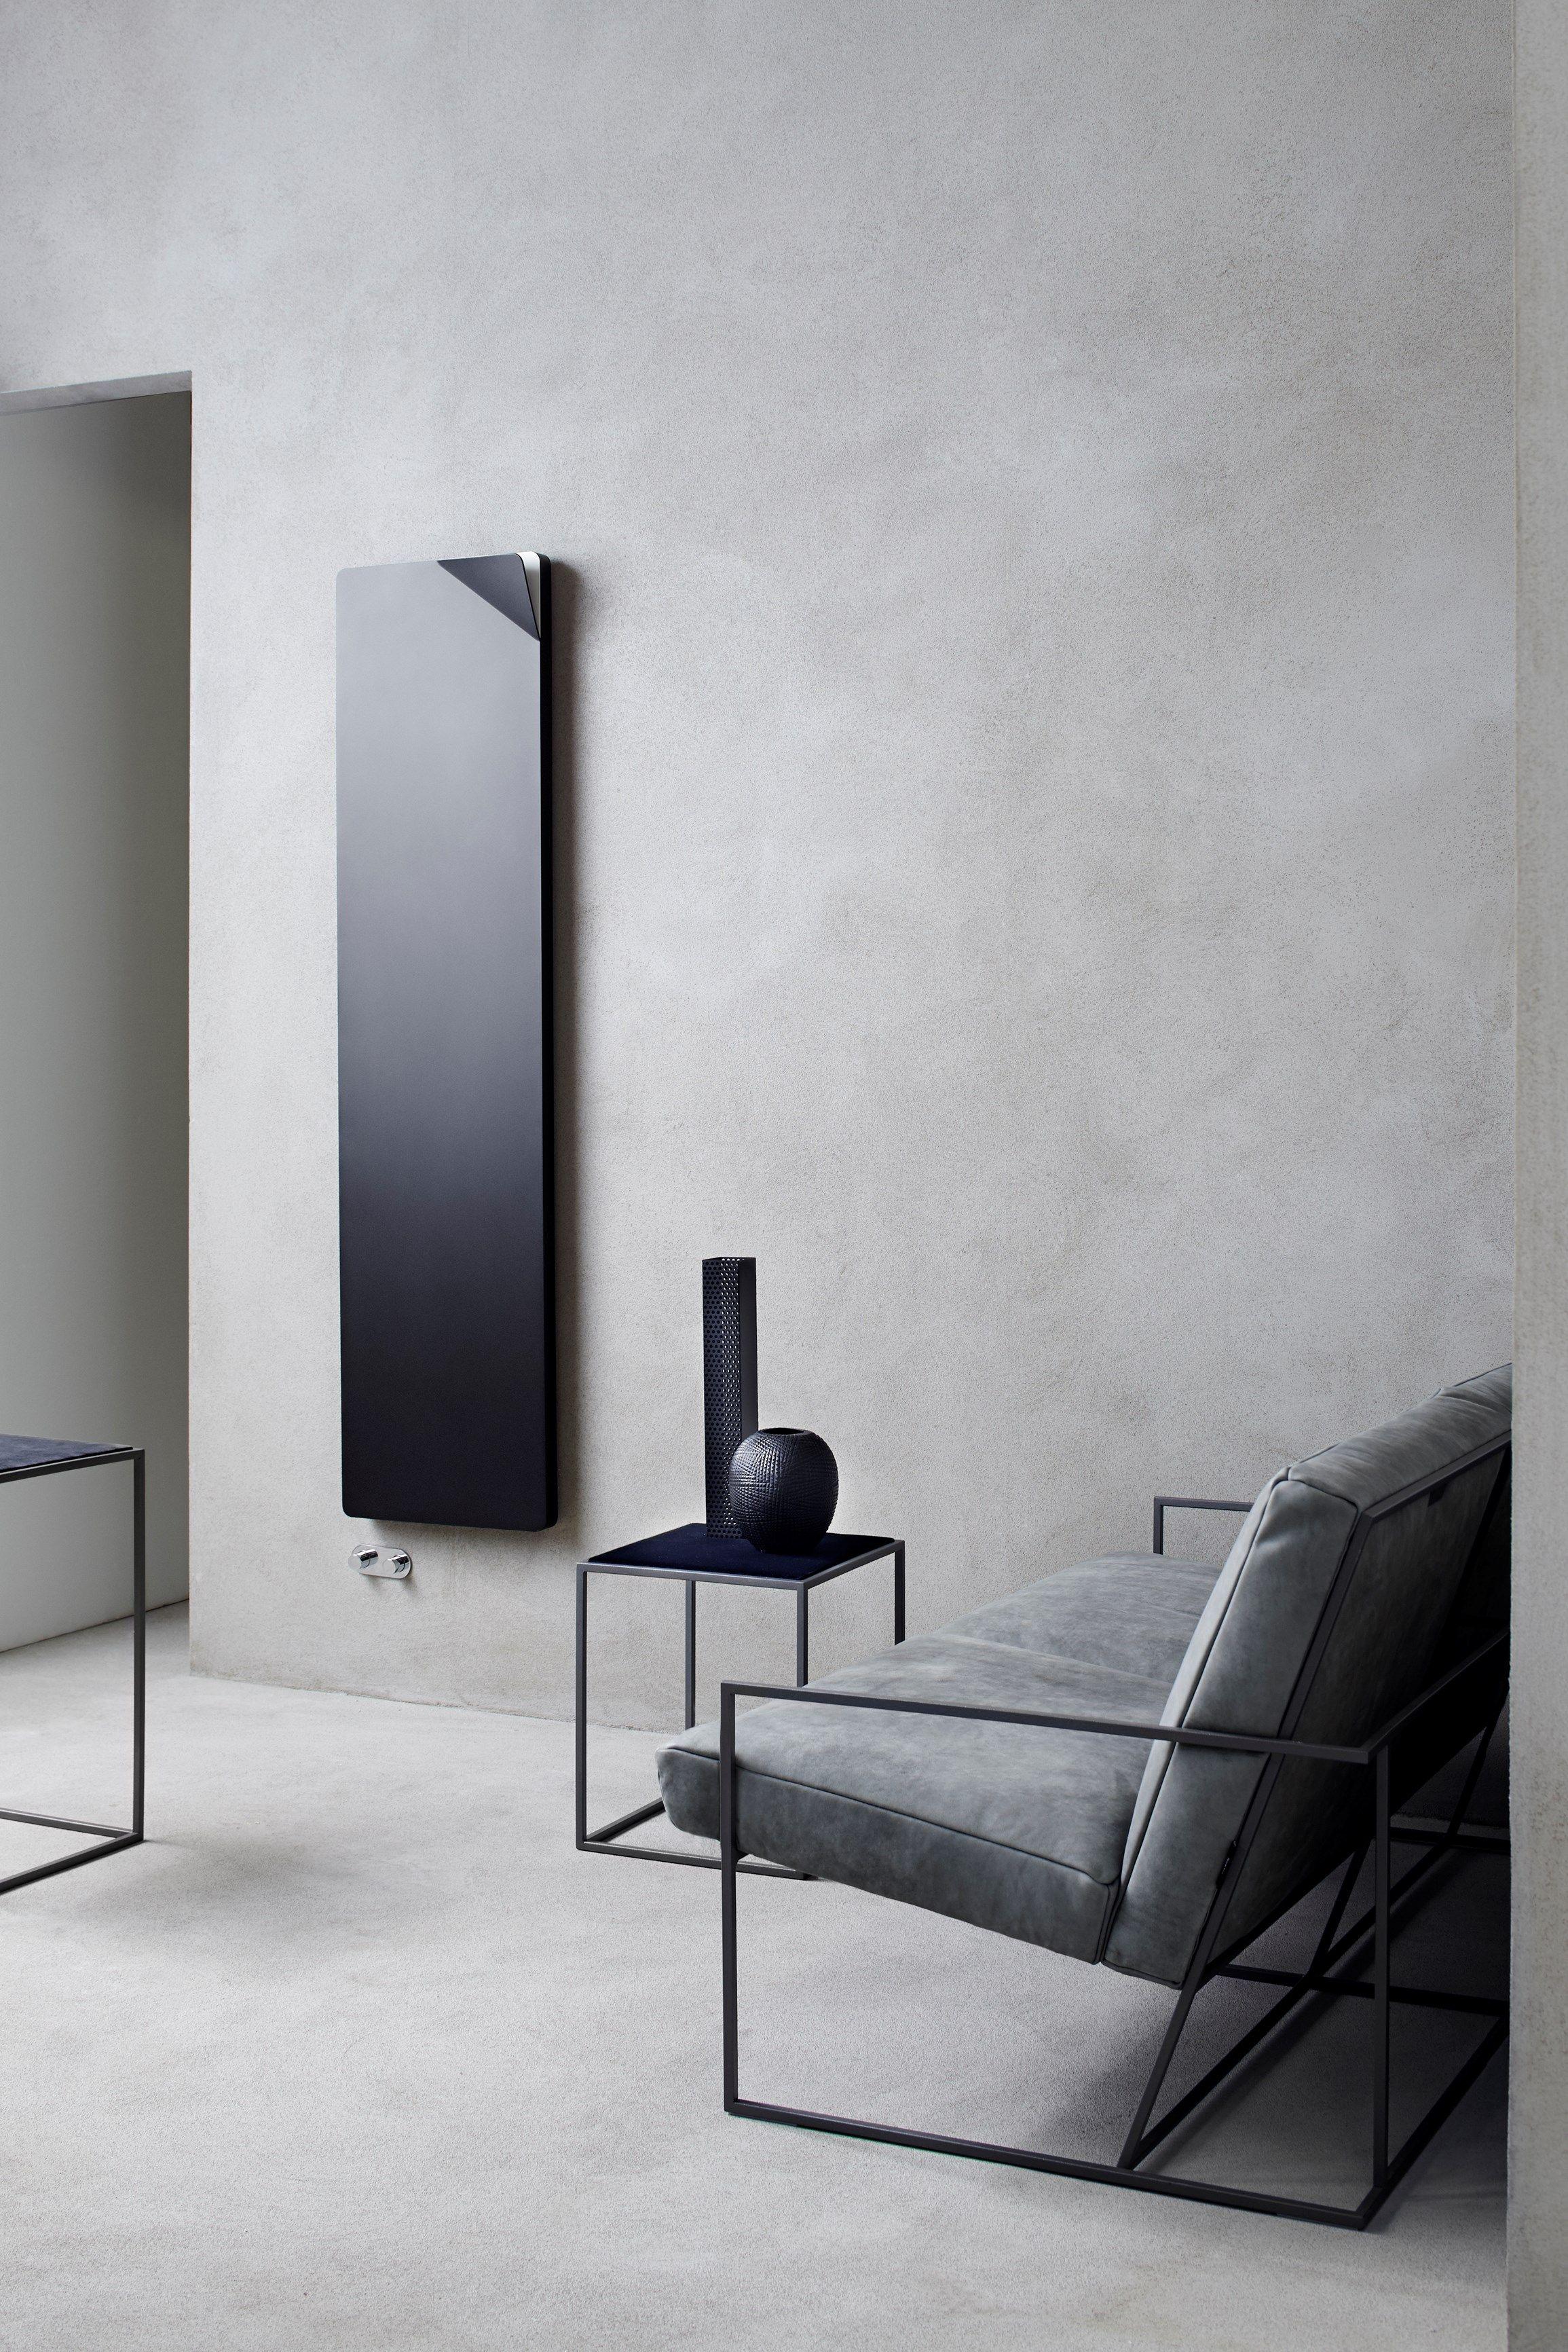 Carbon Steel Panel Radiator Book By Caleido Design Marco Piva Steel Furniture Design Minimal Furniture Design Minimalist Furniture Design